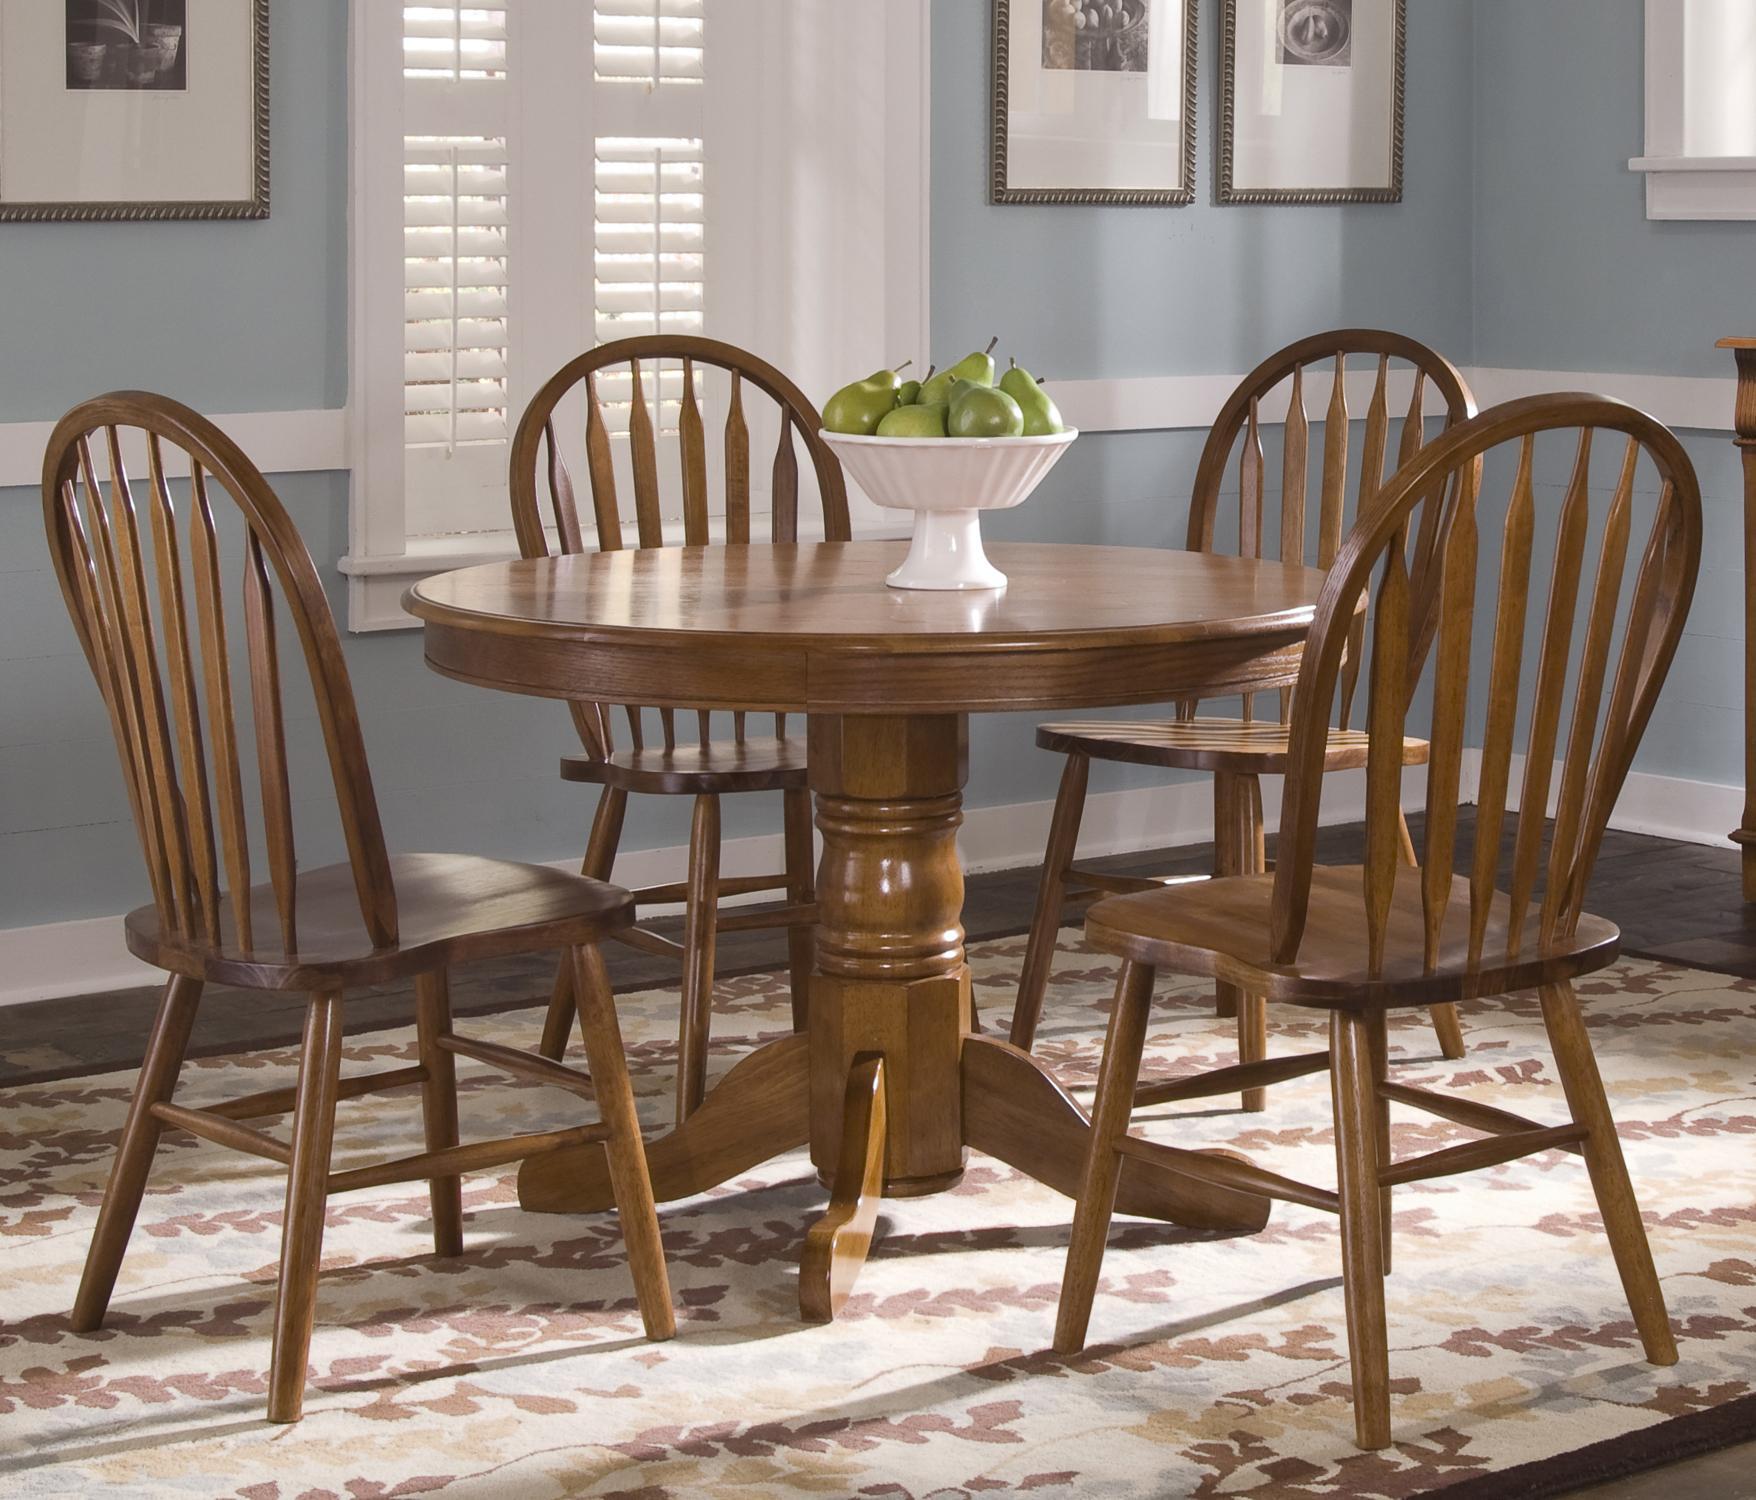 Nostalgia  Five Piece Dining Set by Liberty Furniture at Lapeer Furniture & Mattress Center